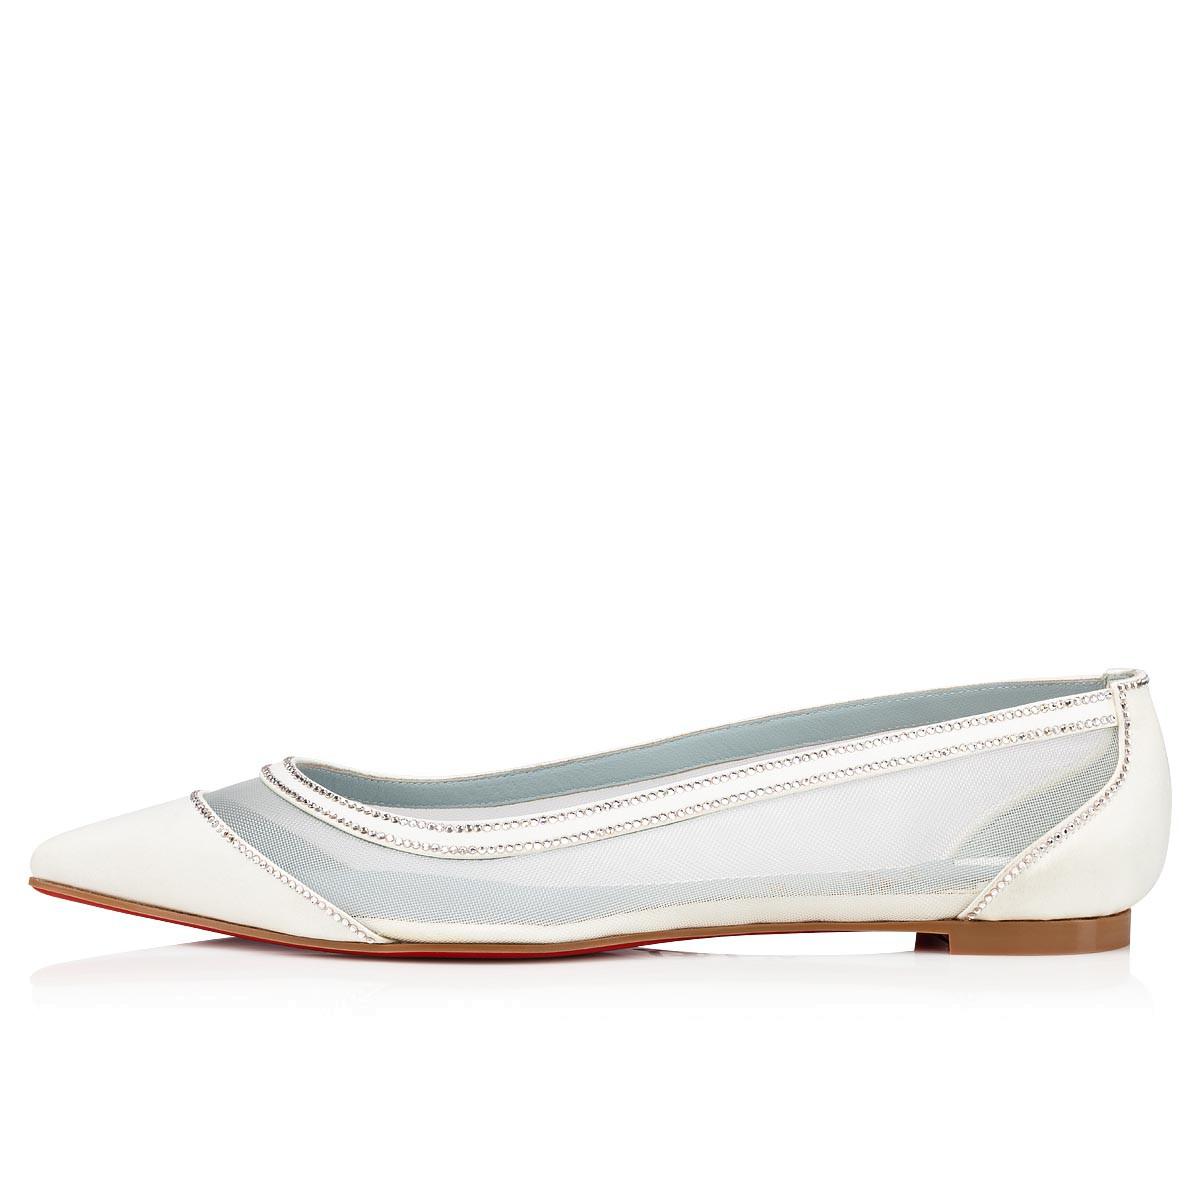 Shoes - Galativi Strass - Christian Louboutin